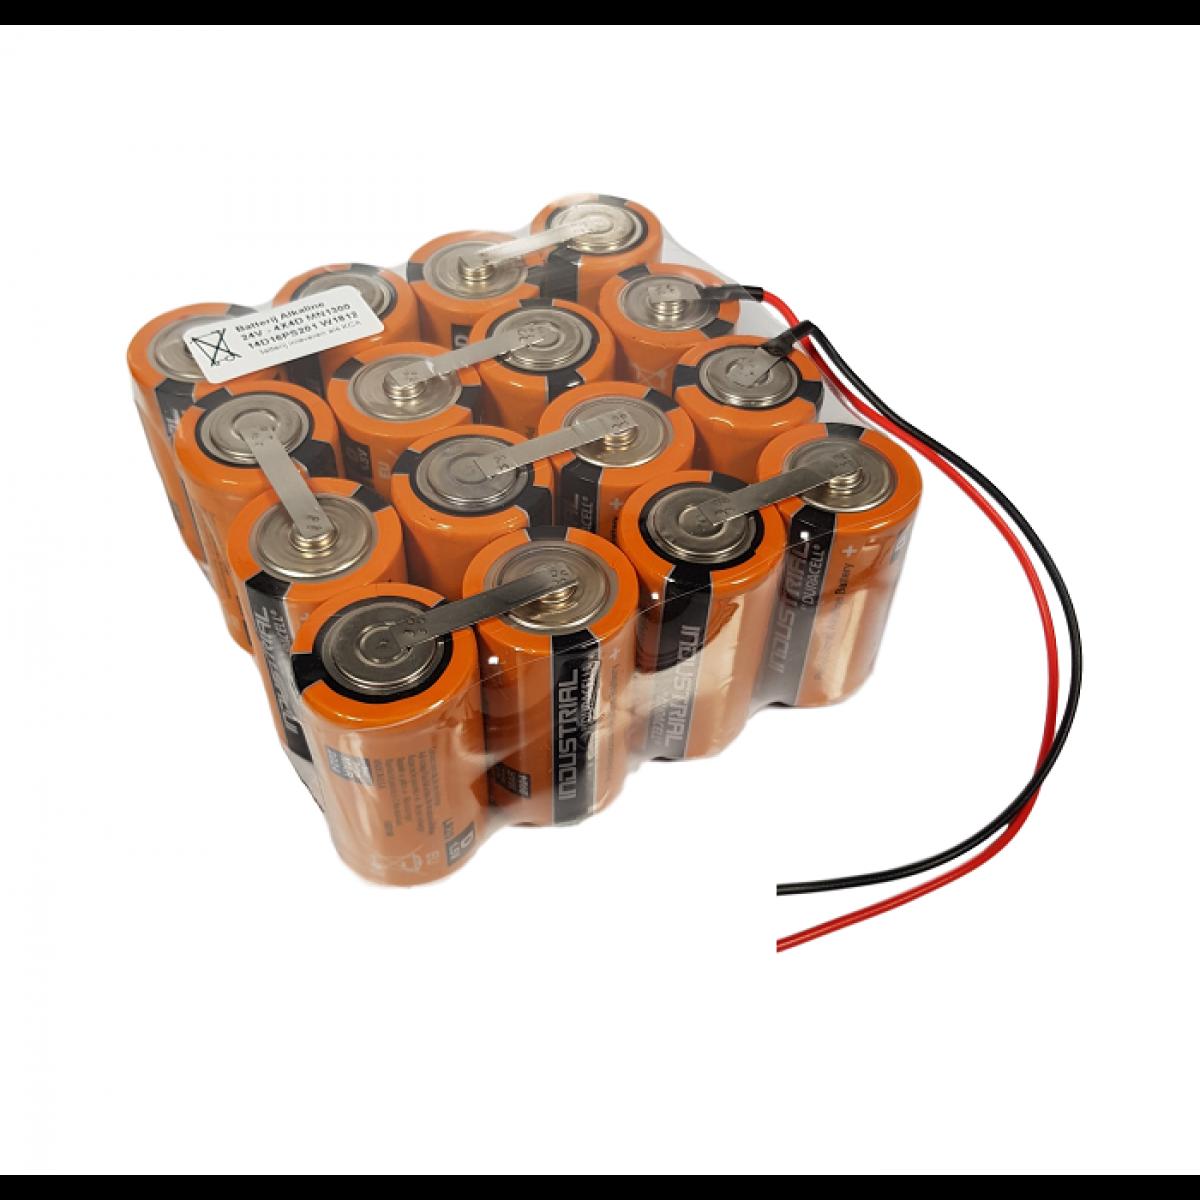 Batterijpack alkaline 4x4D MN1300 Duracell 24V - Draadaansluiting